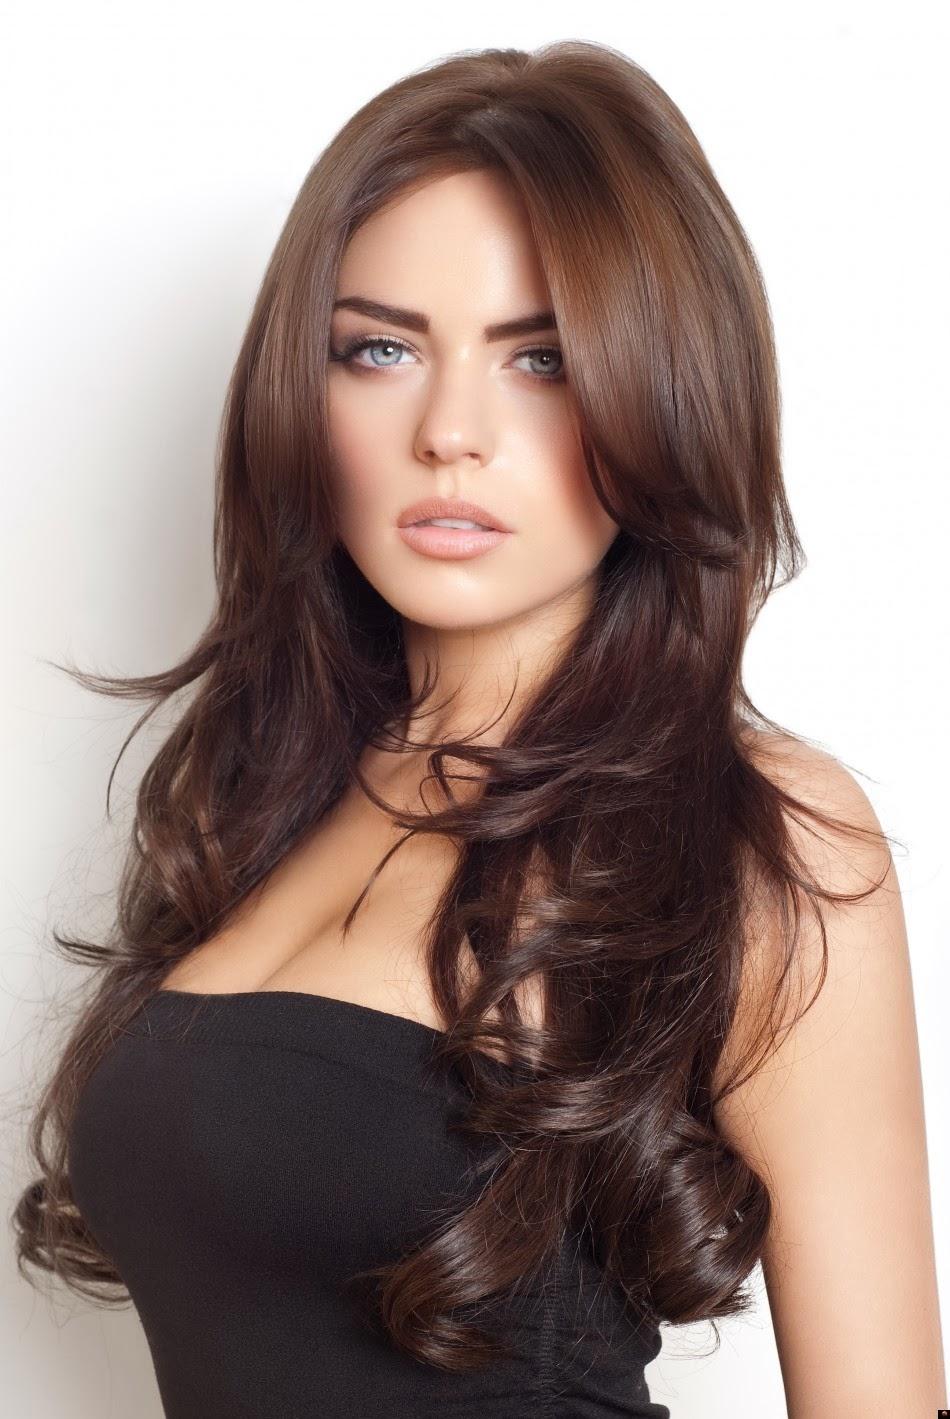 brunette girl beautiful babe - photo #14